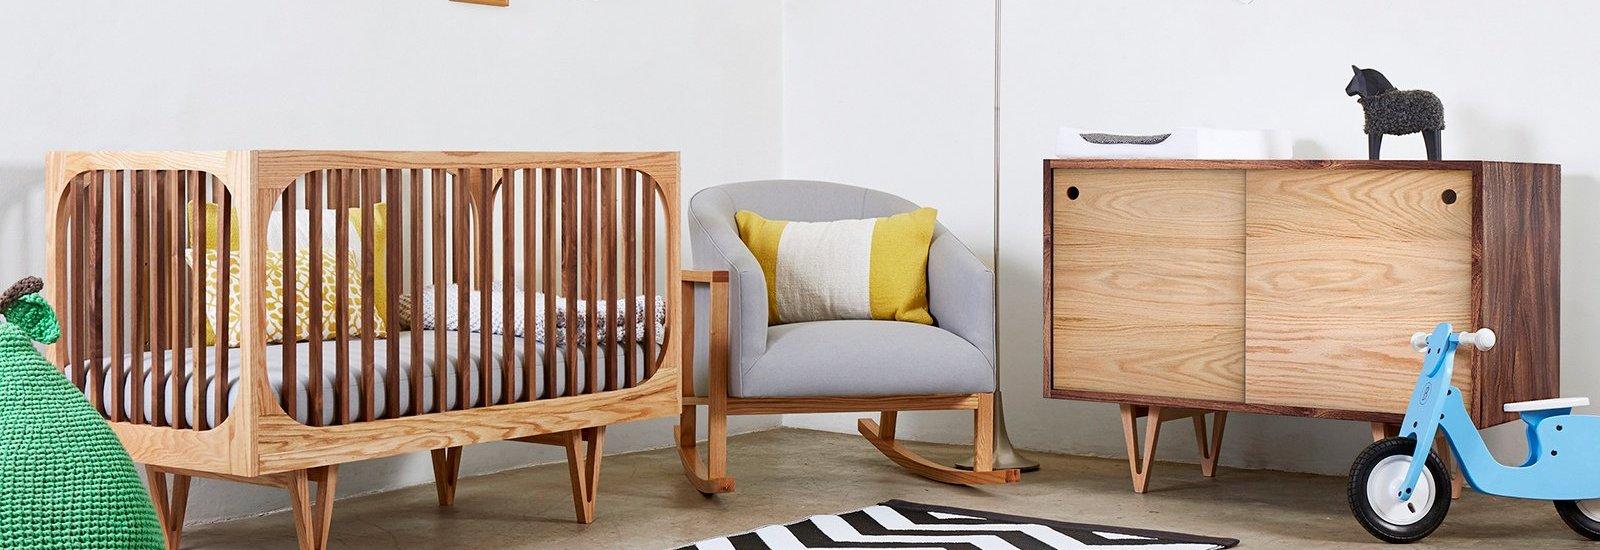 Sleep Tight: Stylish Kids\' Furniture and Accessories ...